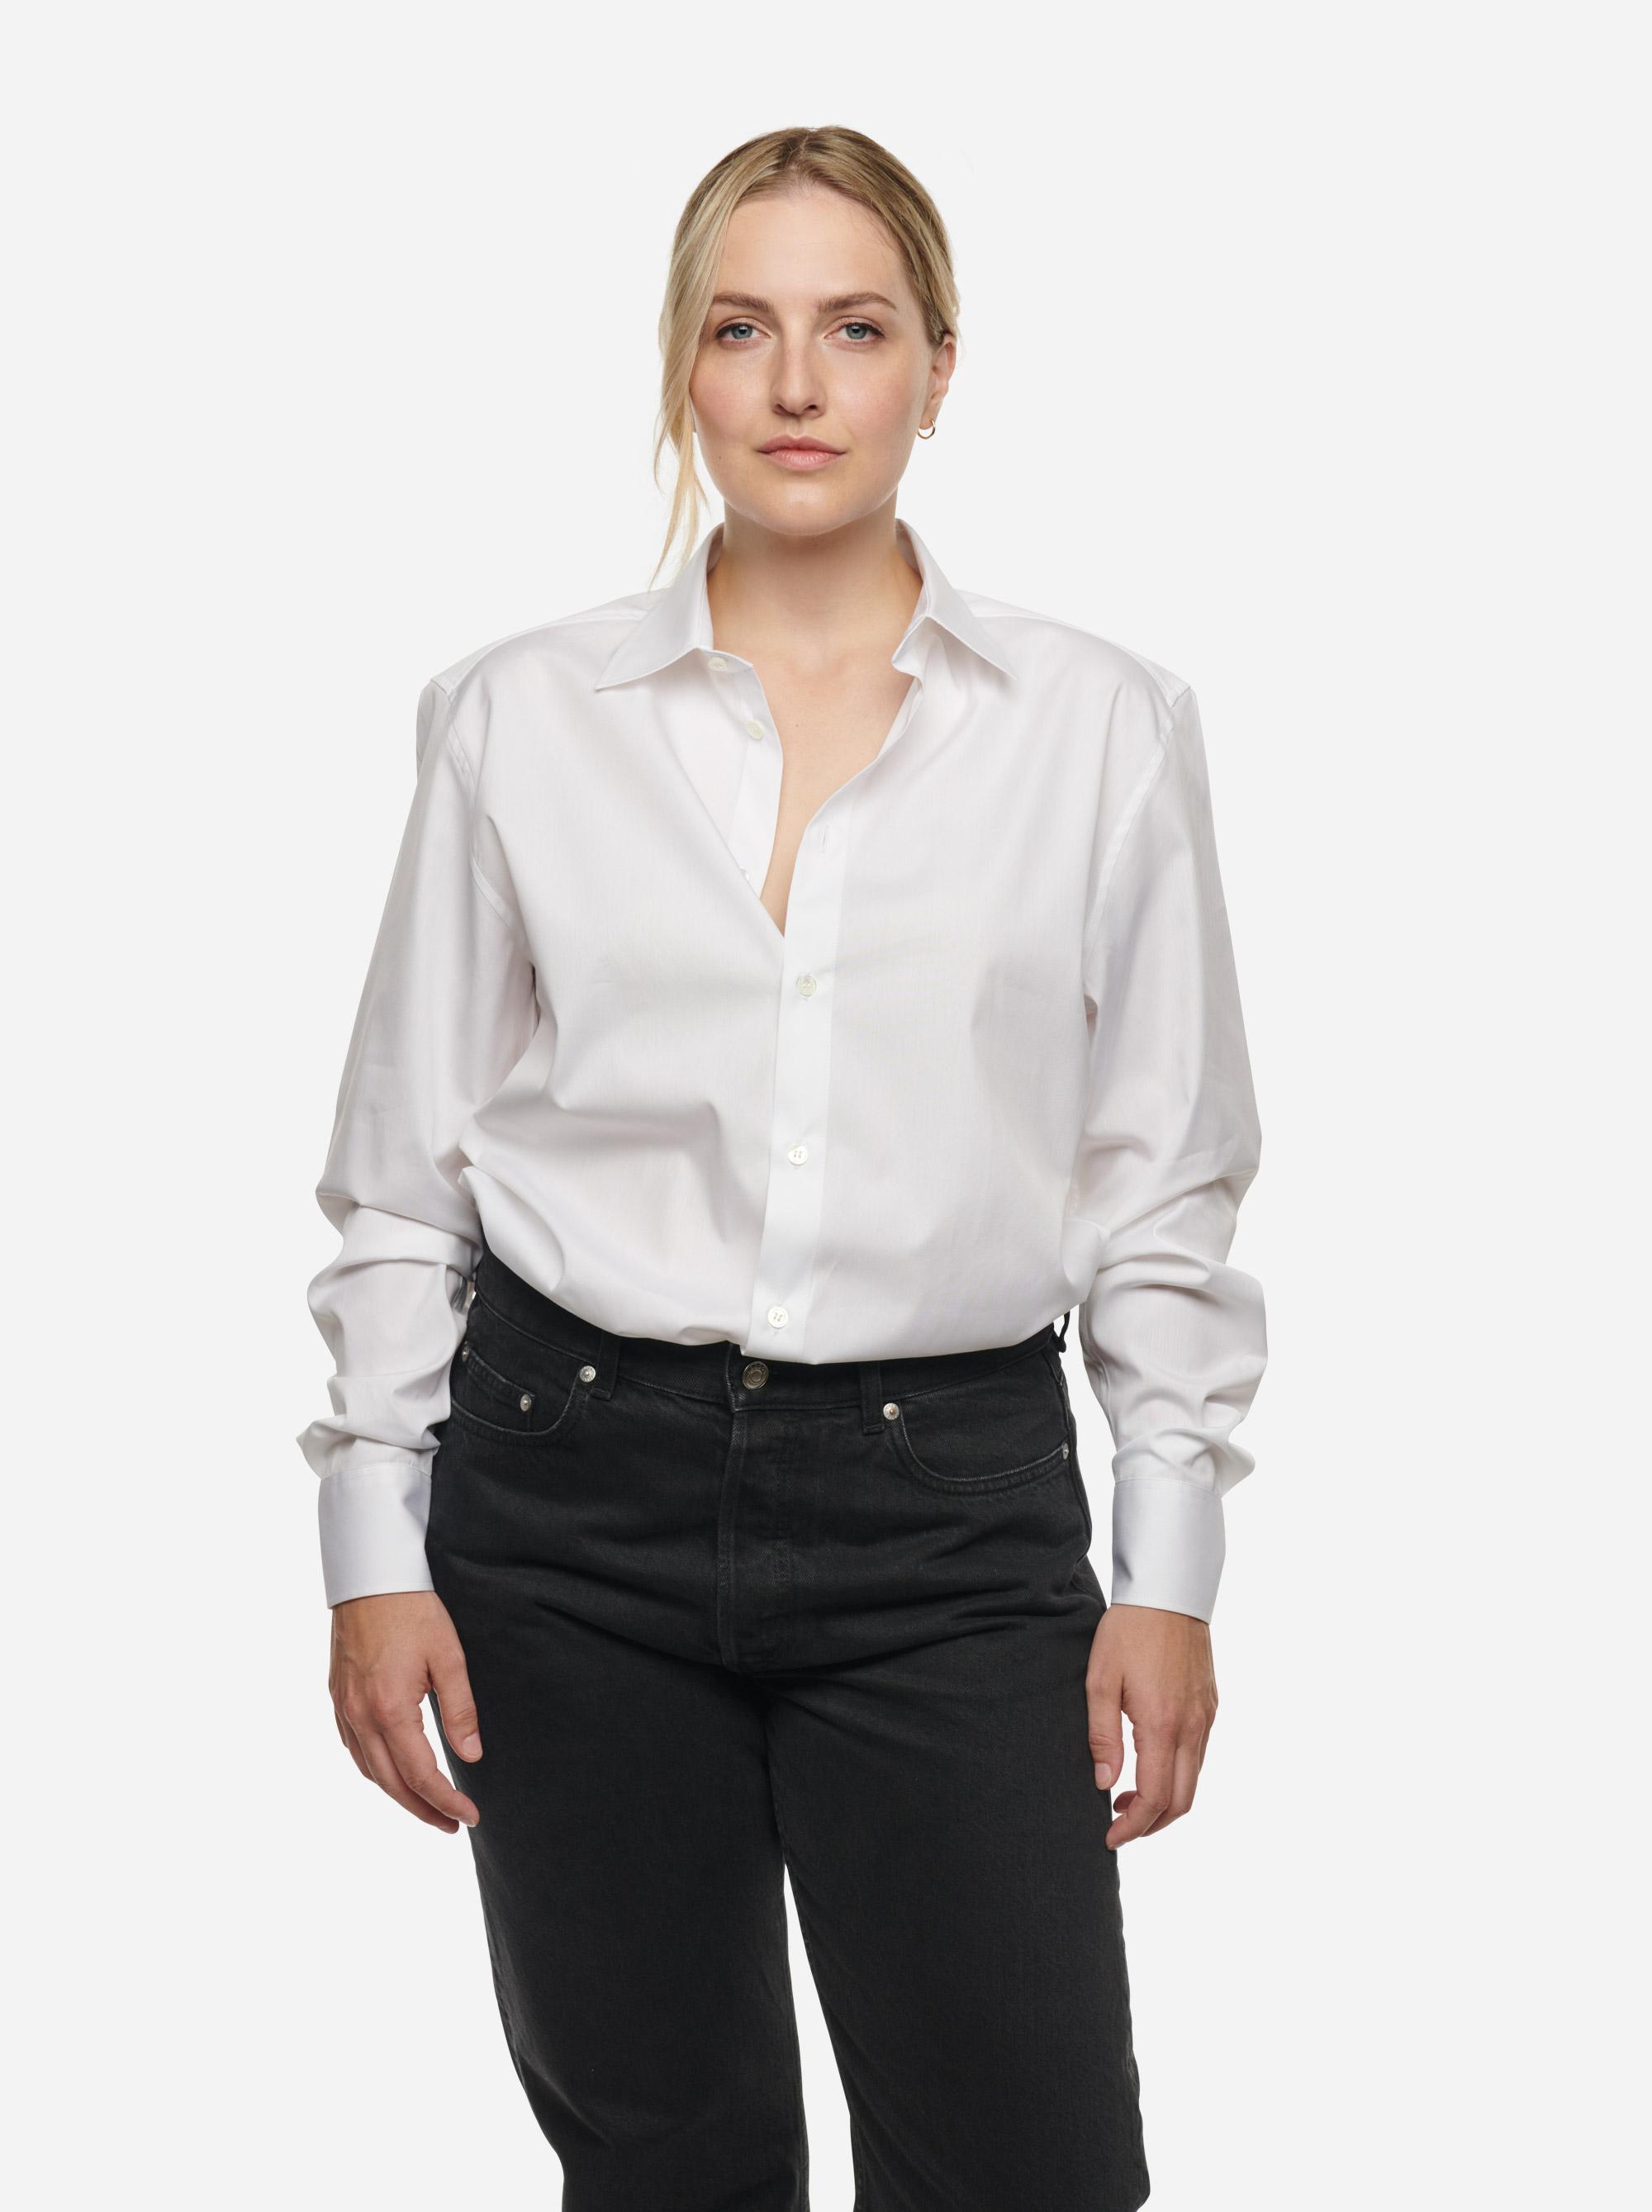 Teym-Shirt-White-women-mens-2